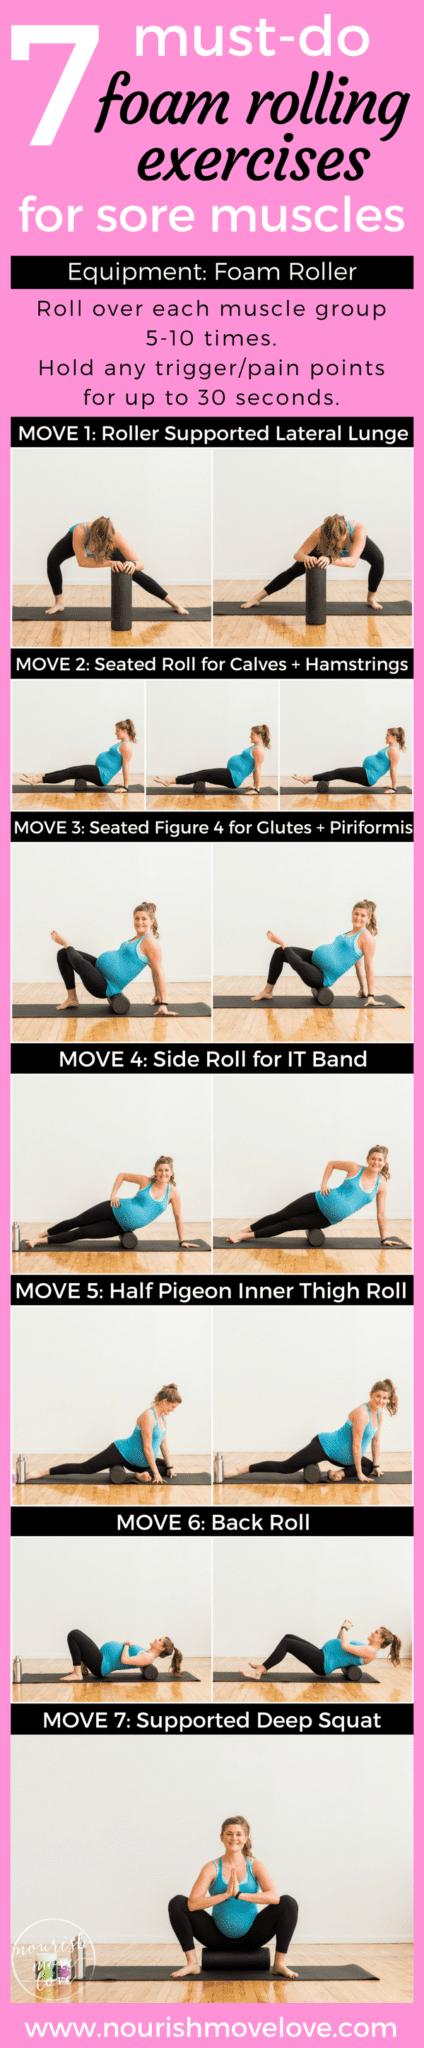 7 Must-Do Foam Rolling Exercises for Sore Muscles | www.nourishmovelove.com